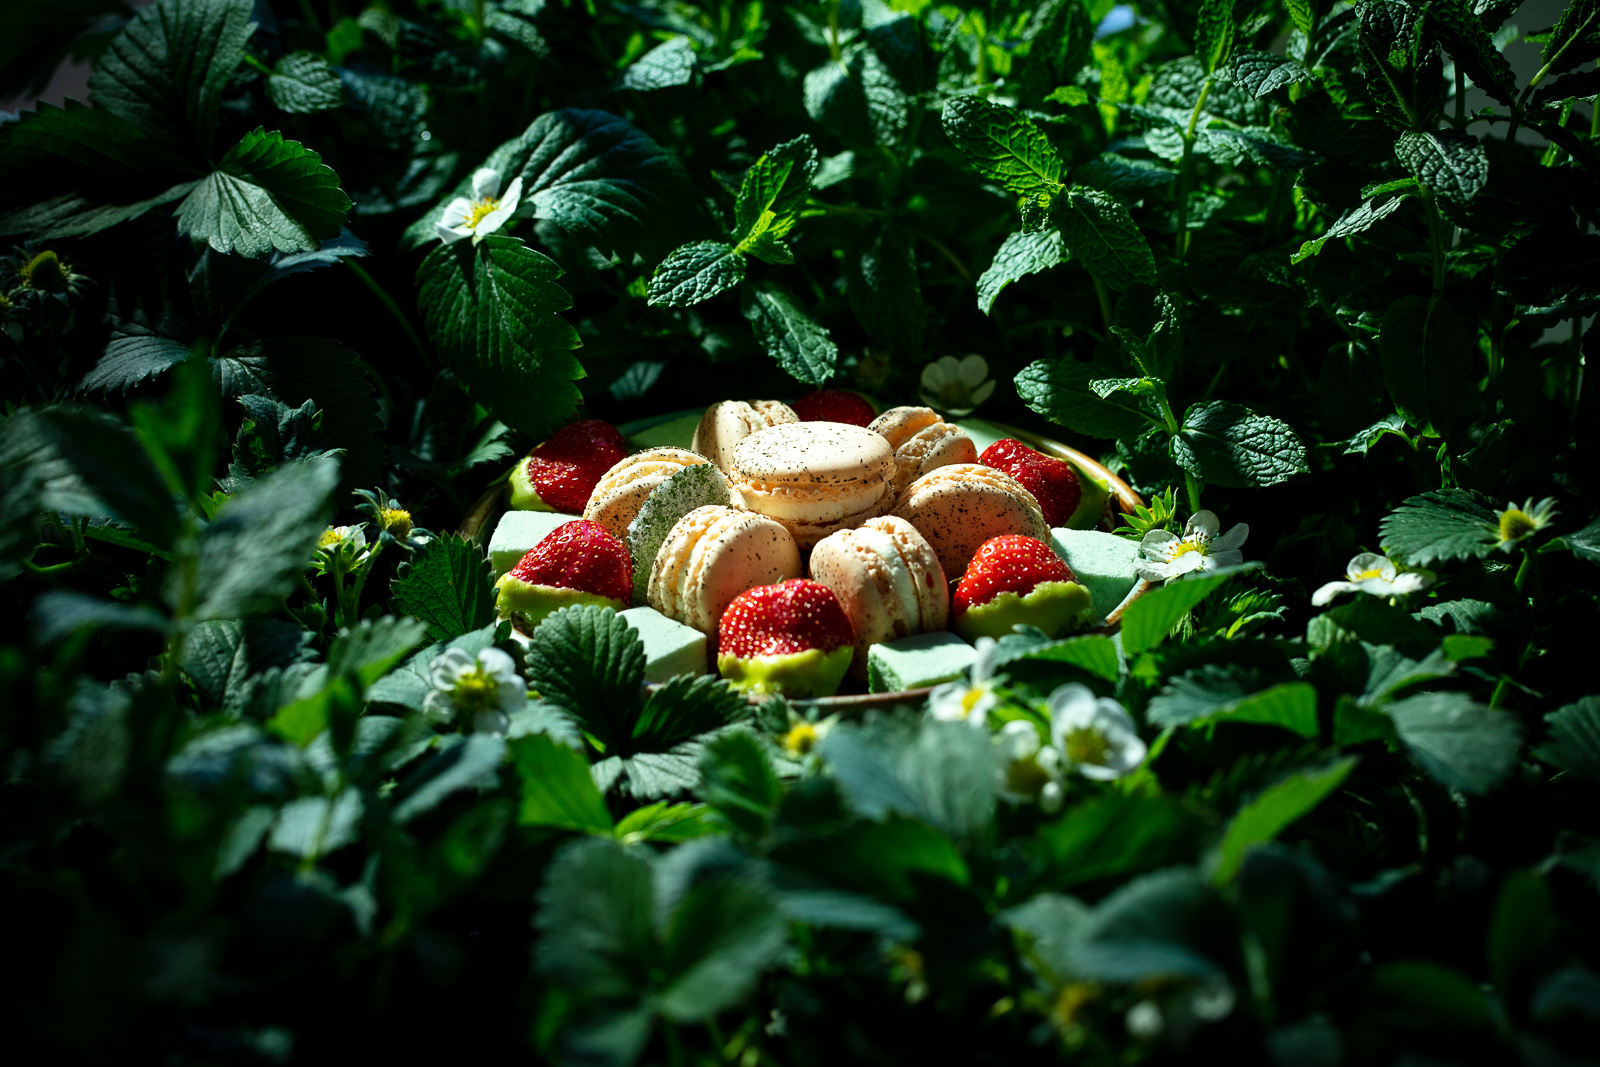 Franck_Hamel_food_photographer_photographeculinaire_valerie_paumelle_agent_st_clair_traiteur (11).jpg